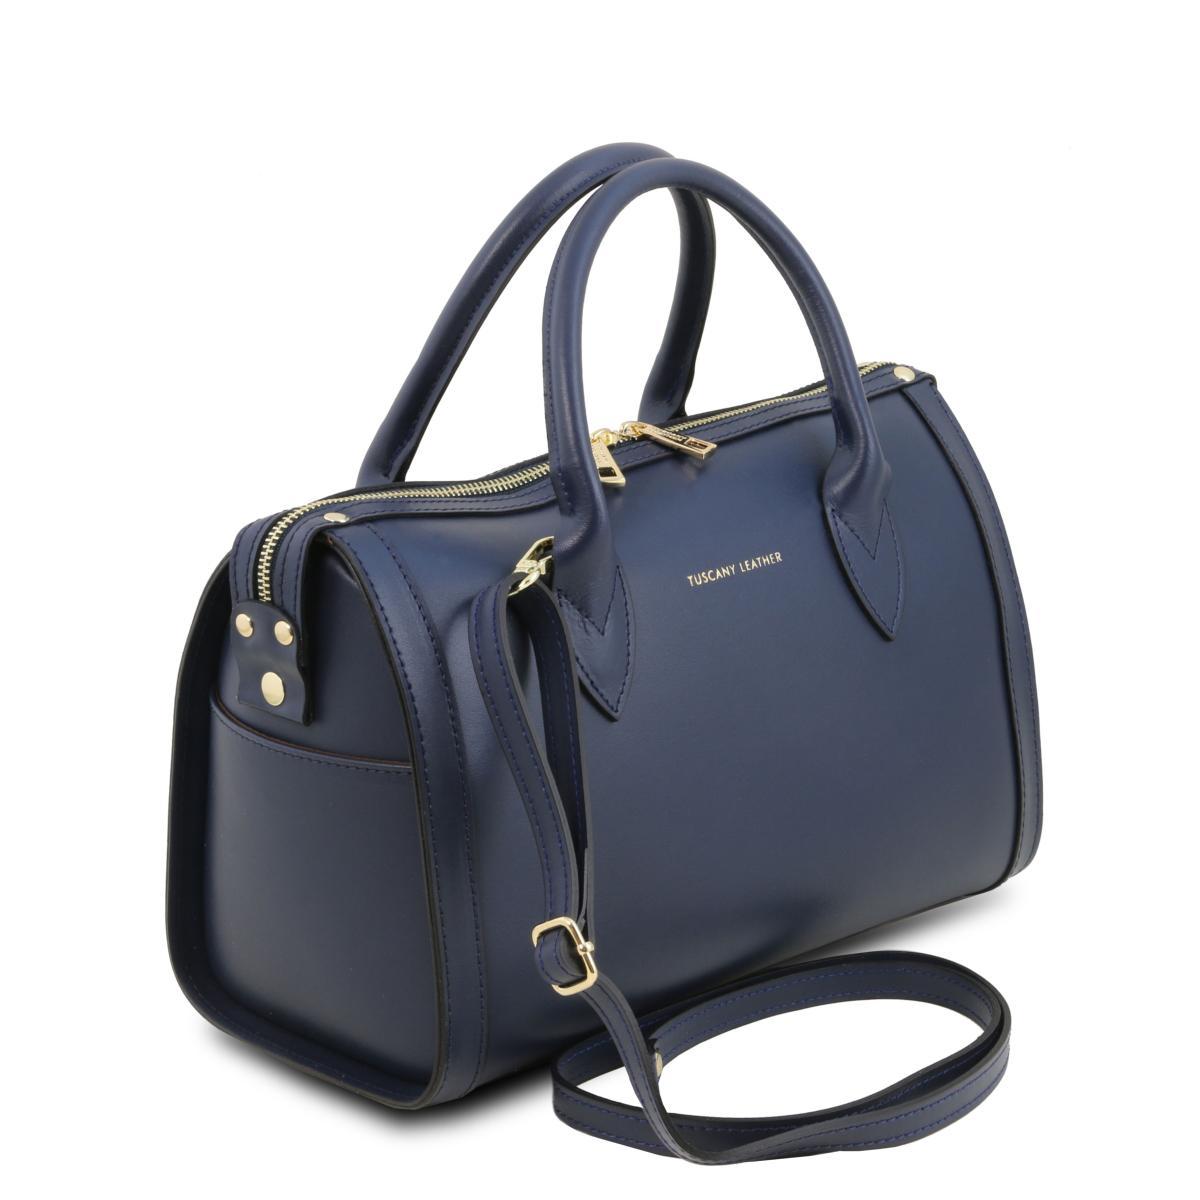 design intemporel c5c14 050e3 Sac Cuir Bowling Femme Bleu Marine - Tuscany Leather -